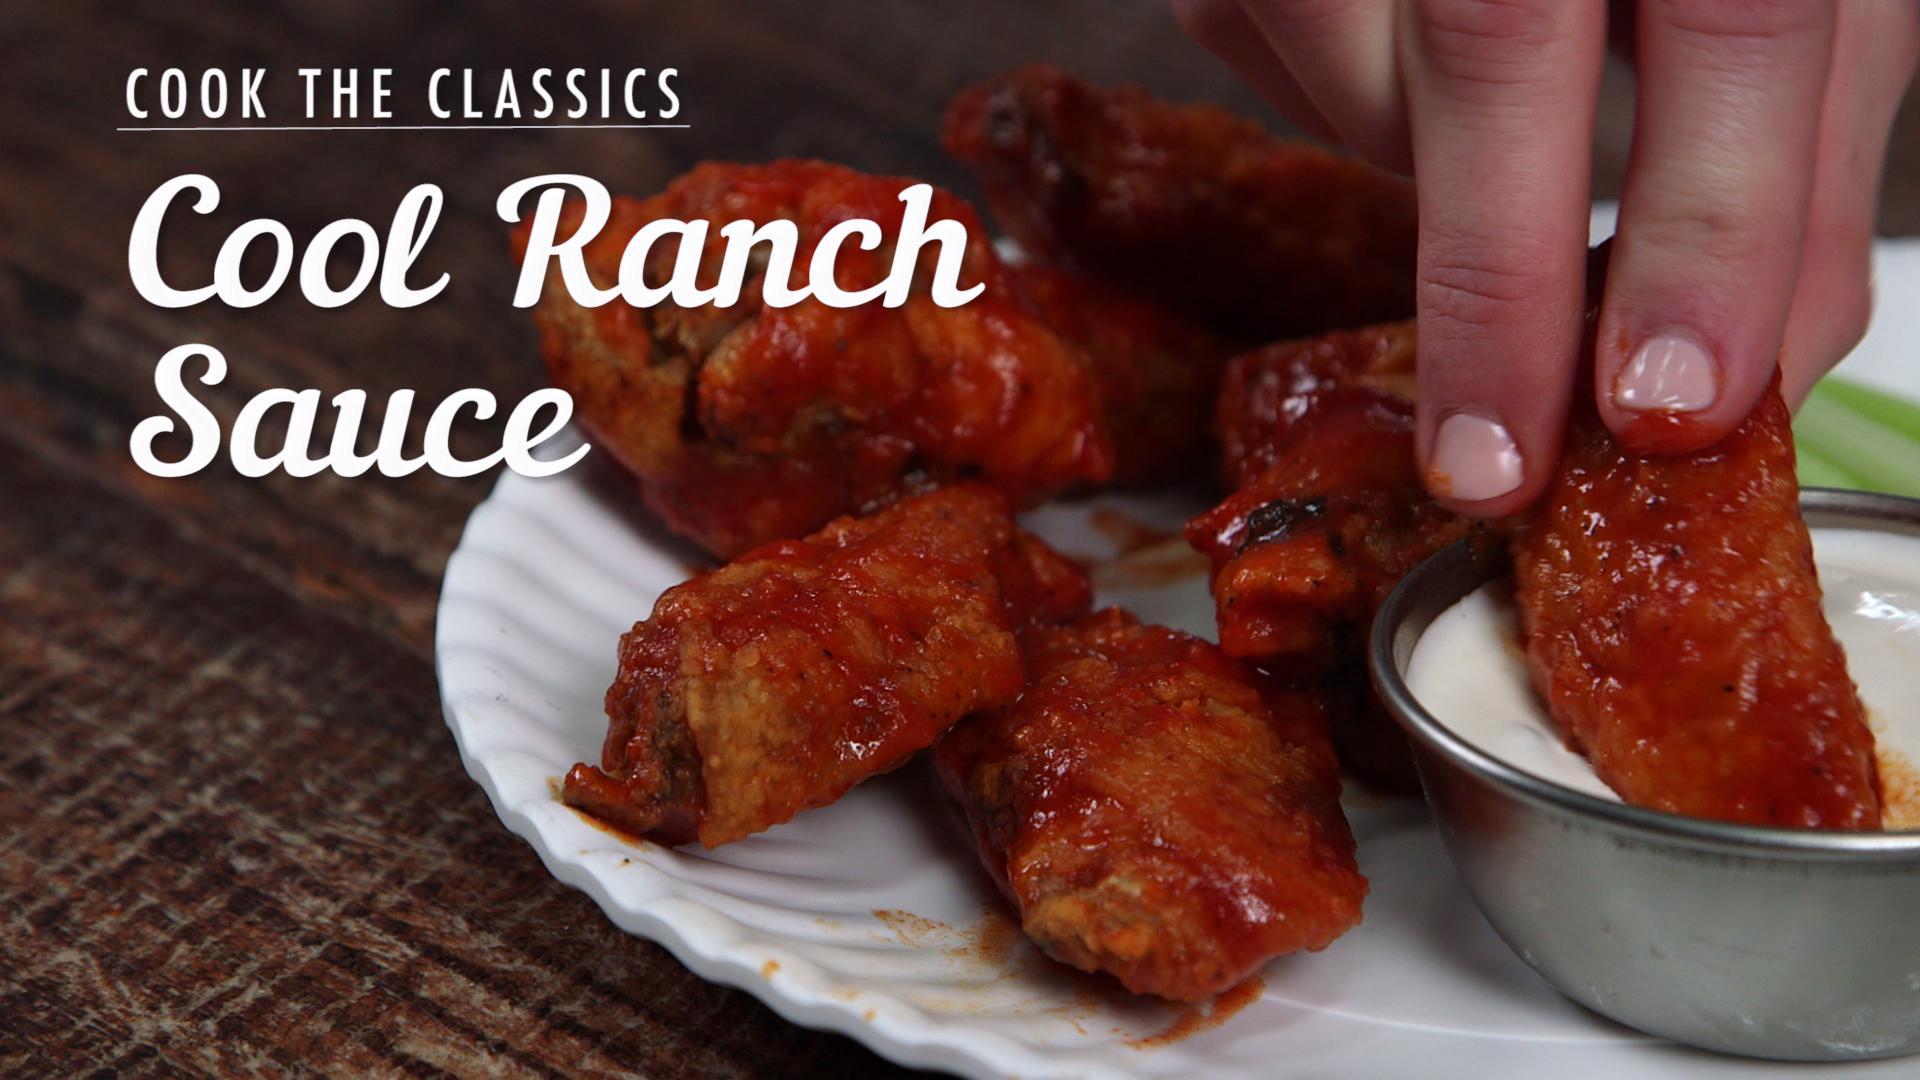 Cool Ranch Sauce